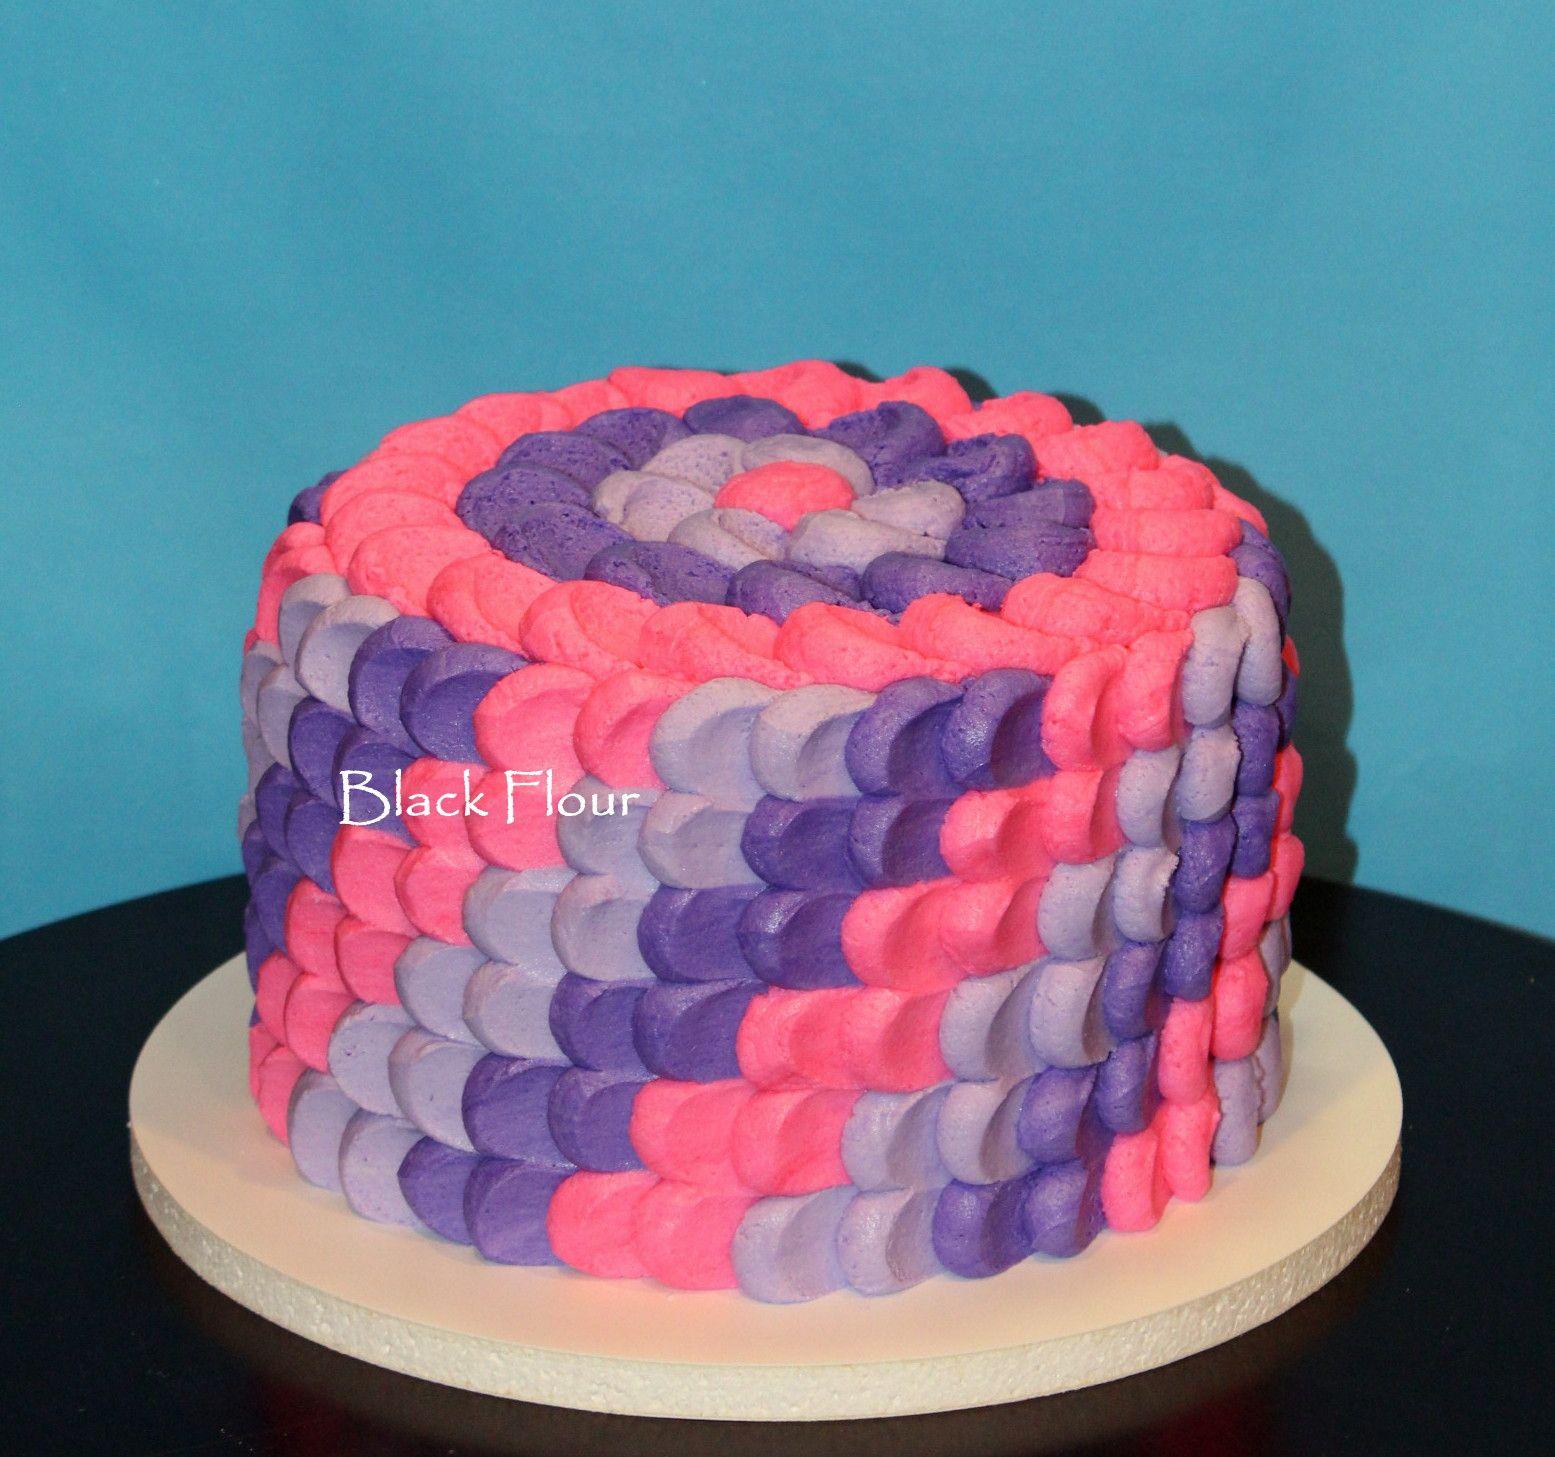 Girly Birthday Cake Images : Girly Birthday Cakes www.imgkid.com - The Image Kid Has It!